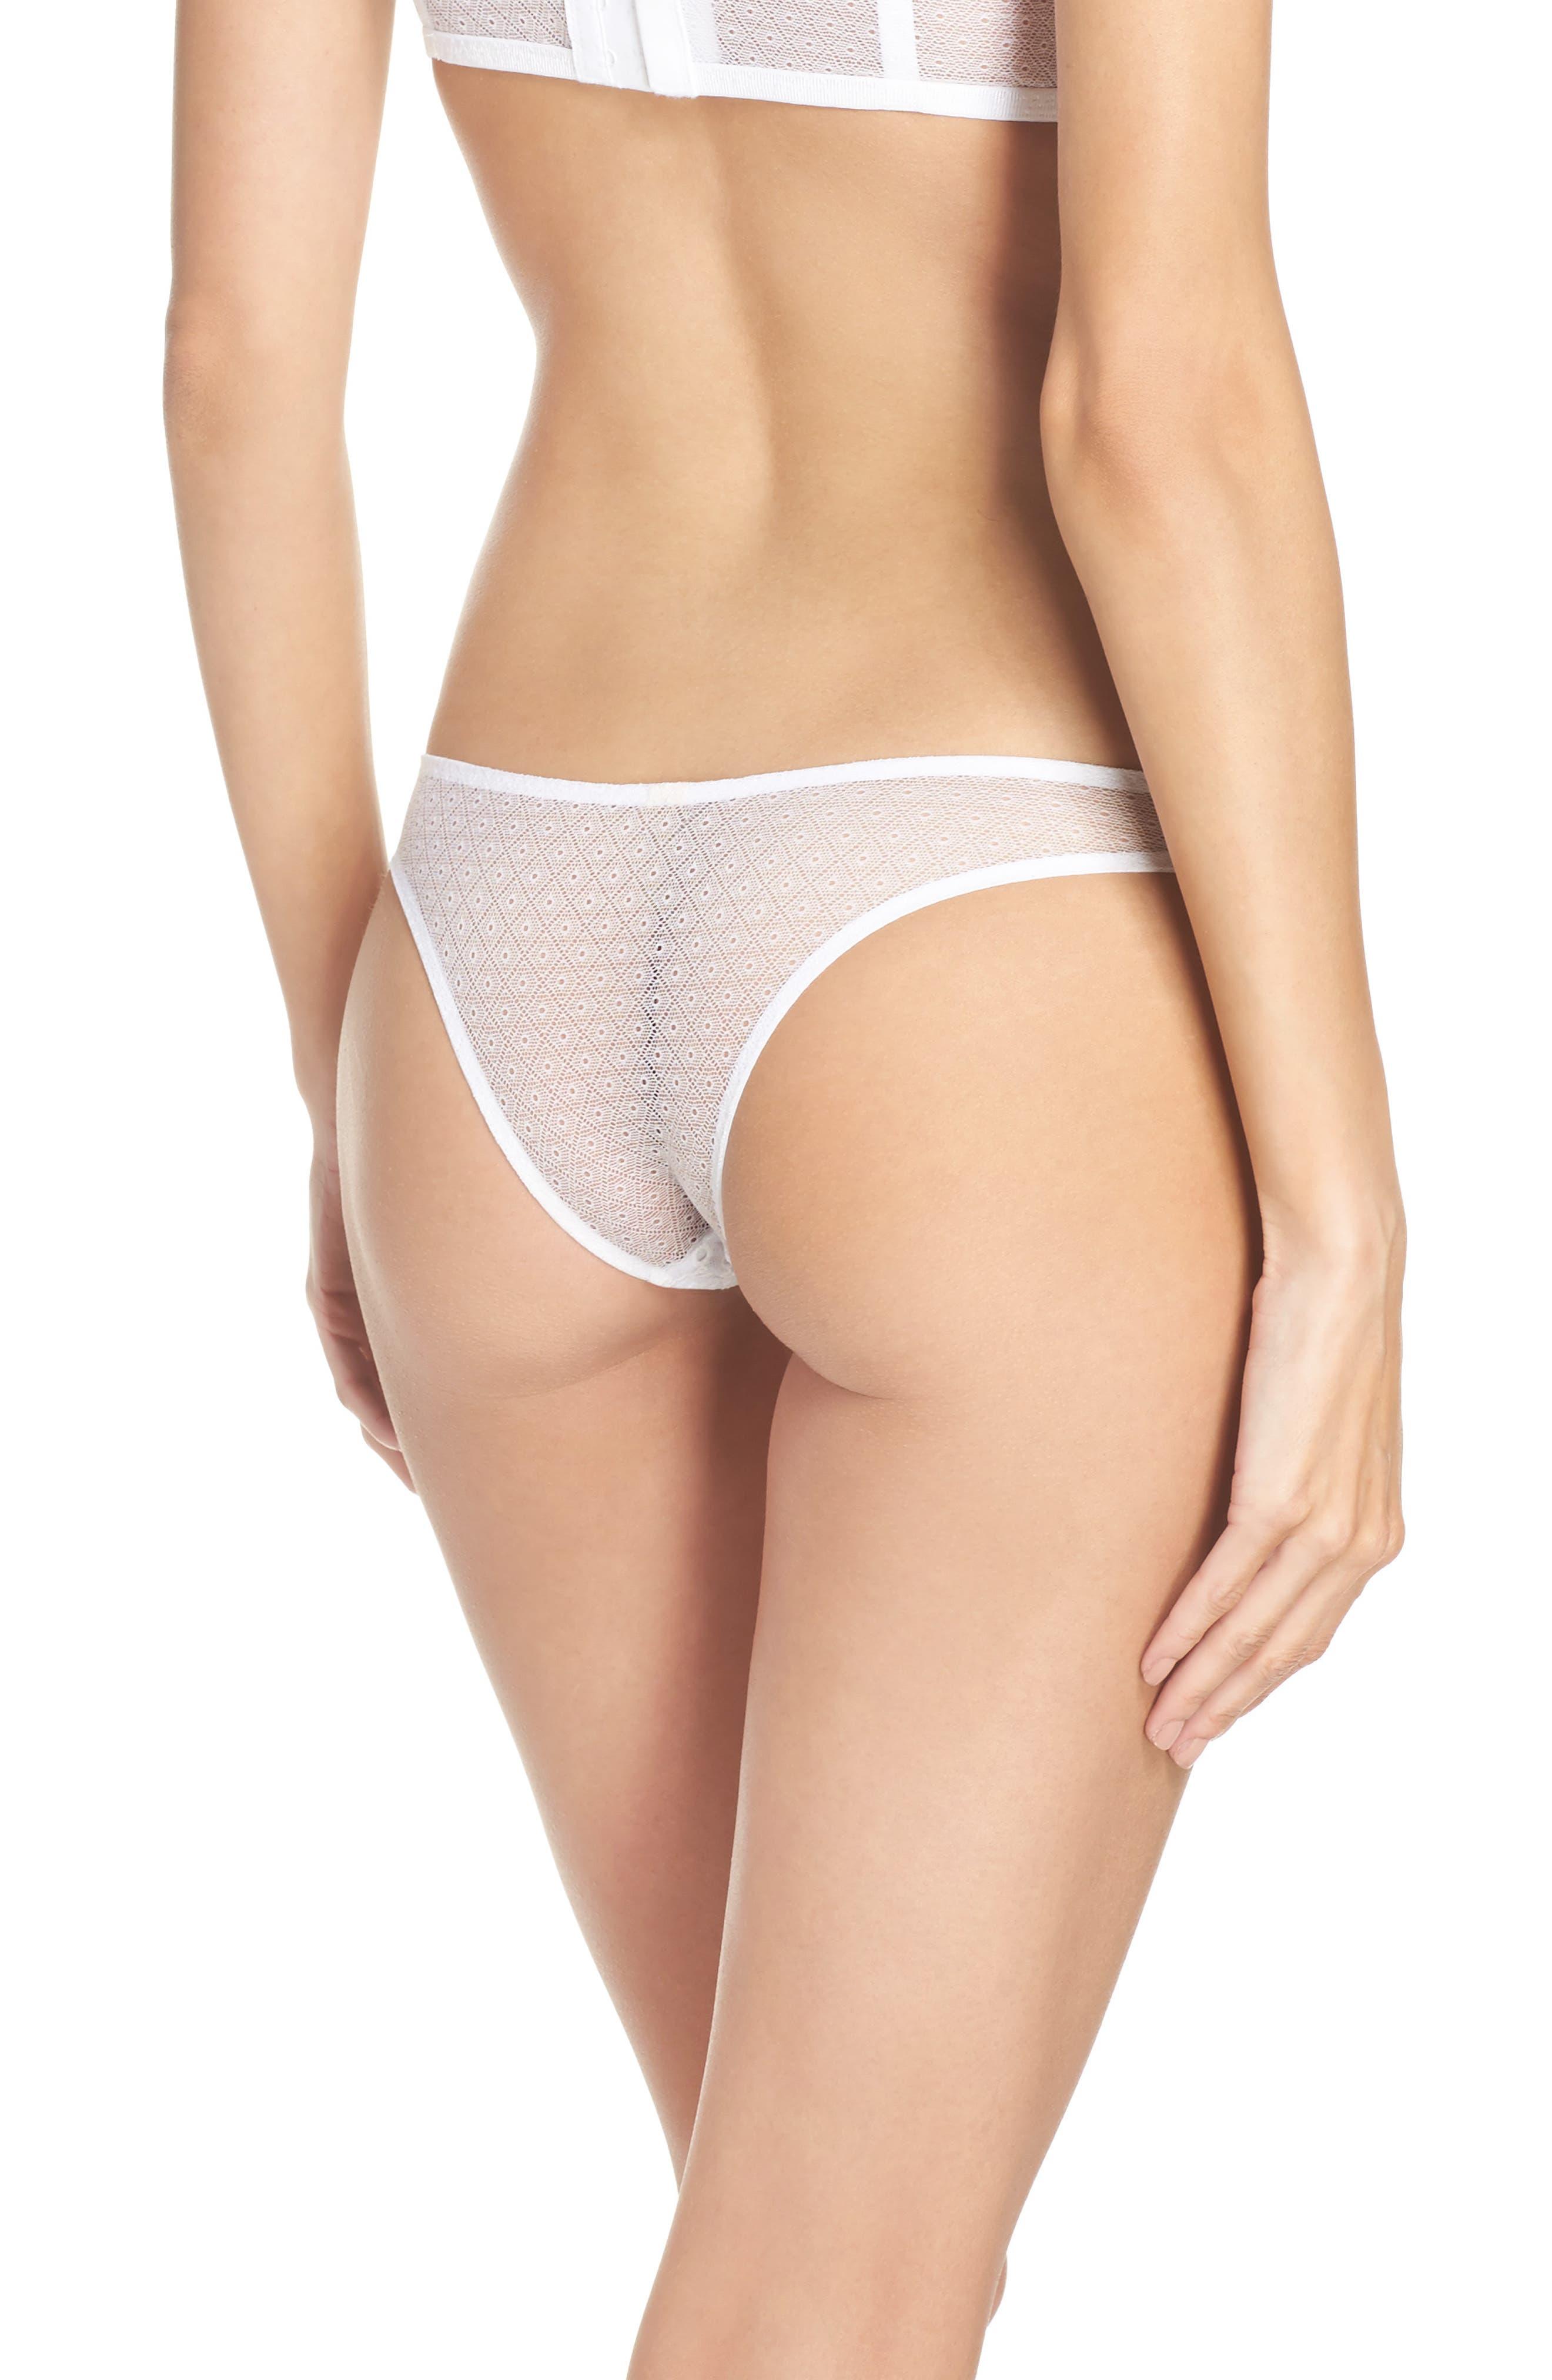 Intimately FP St. Tropez Tanga Panties,                             Alternate thumbnail 2, color,                             White